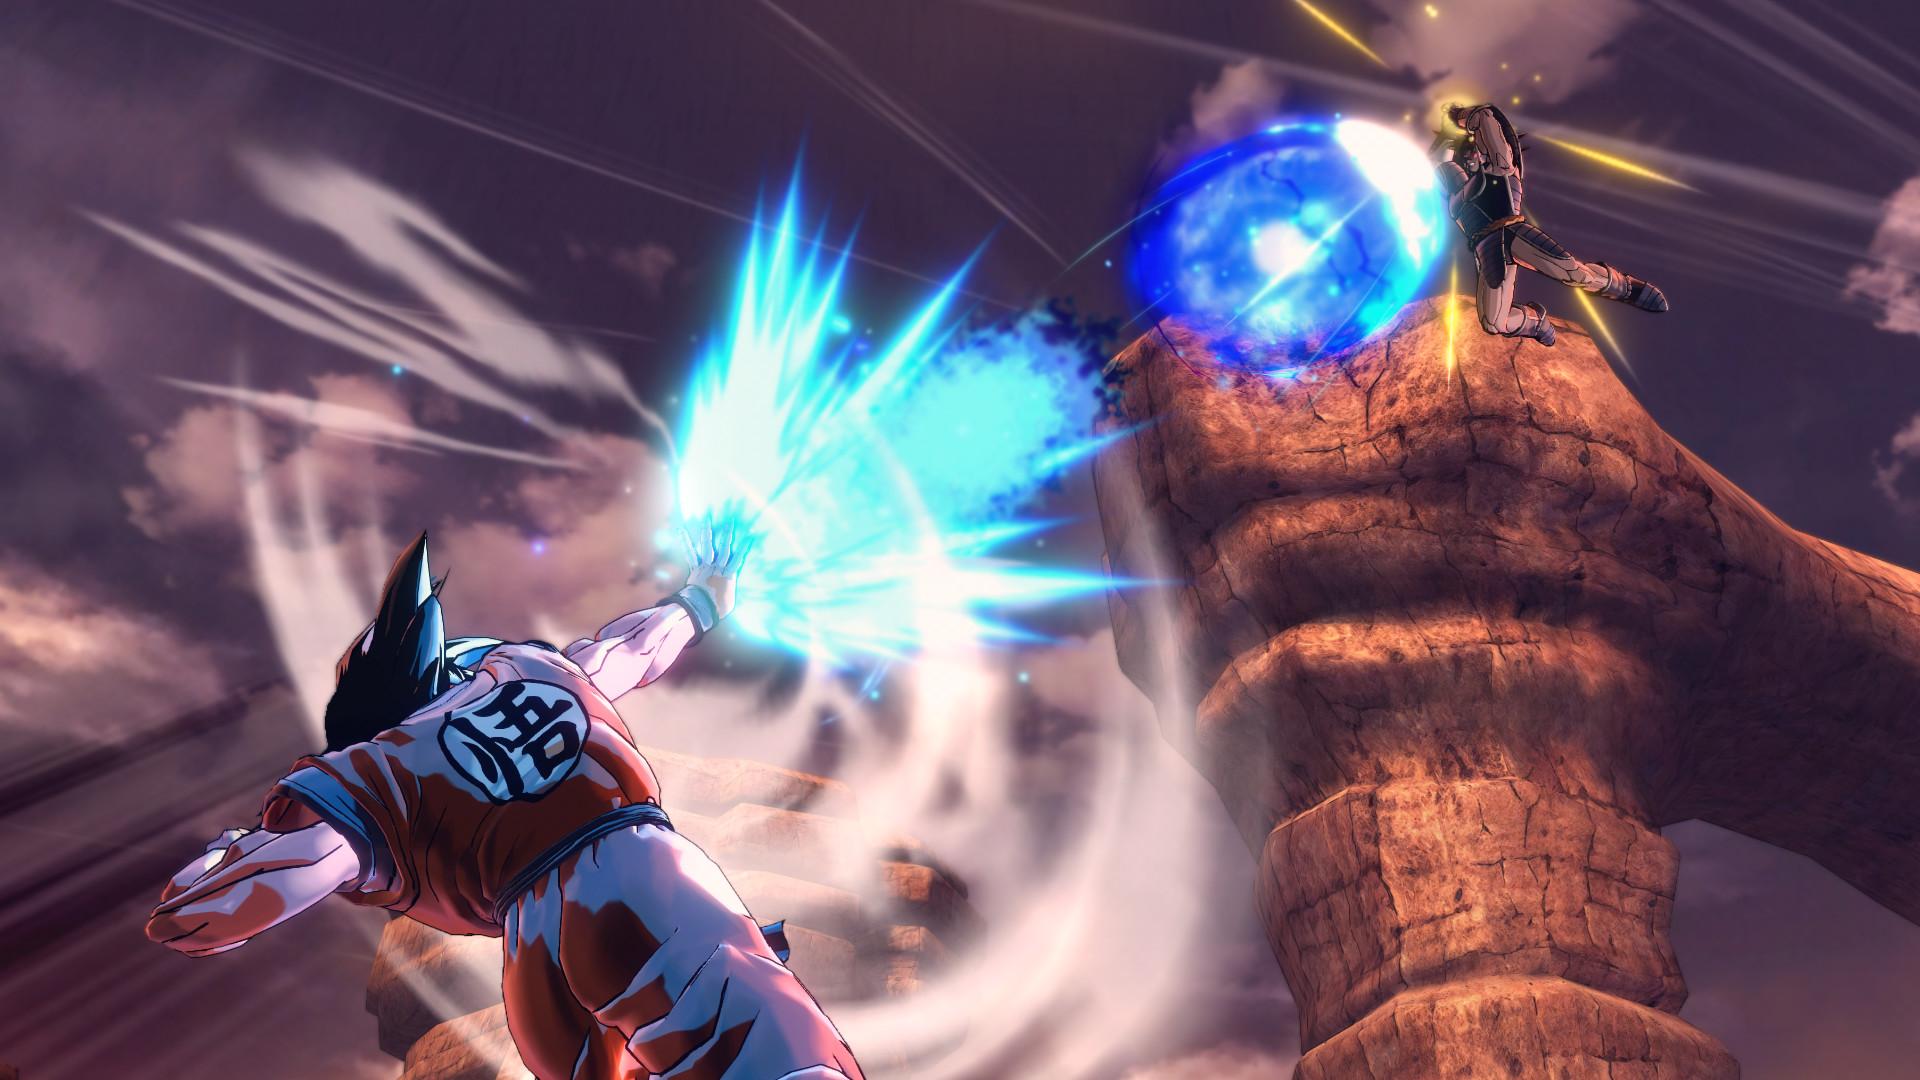 dragon-ball-xenoverse-2-pc-screenshot-1